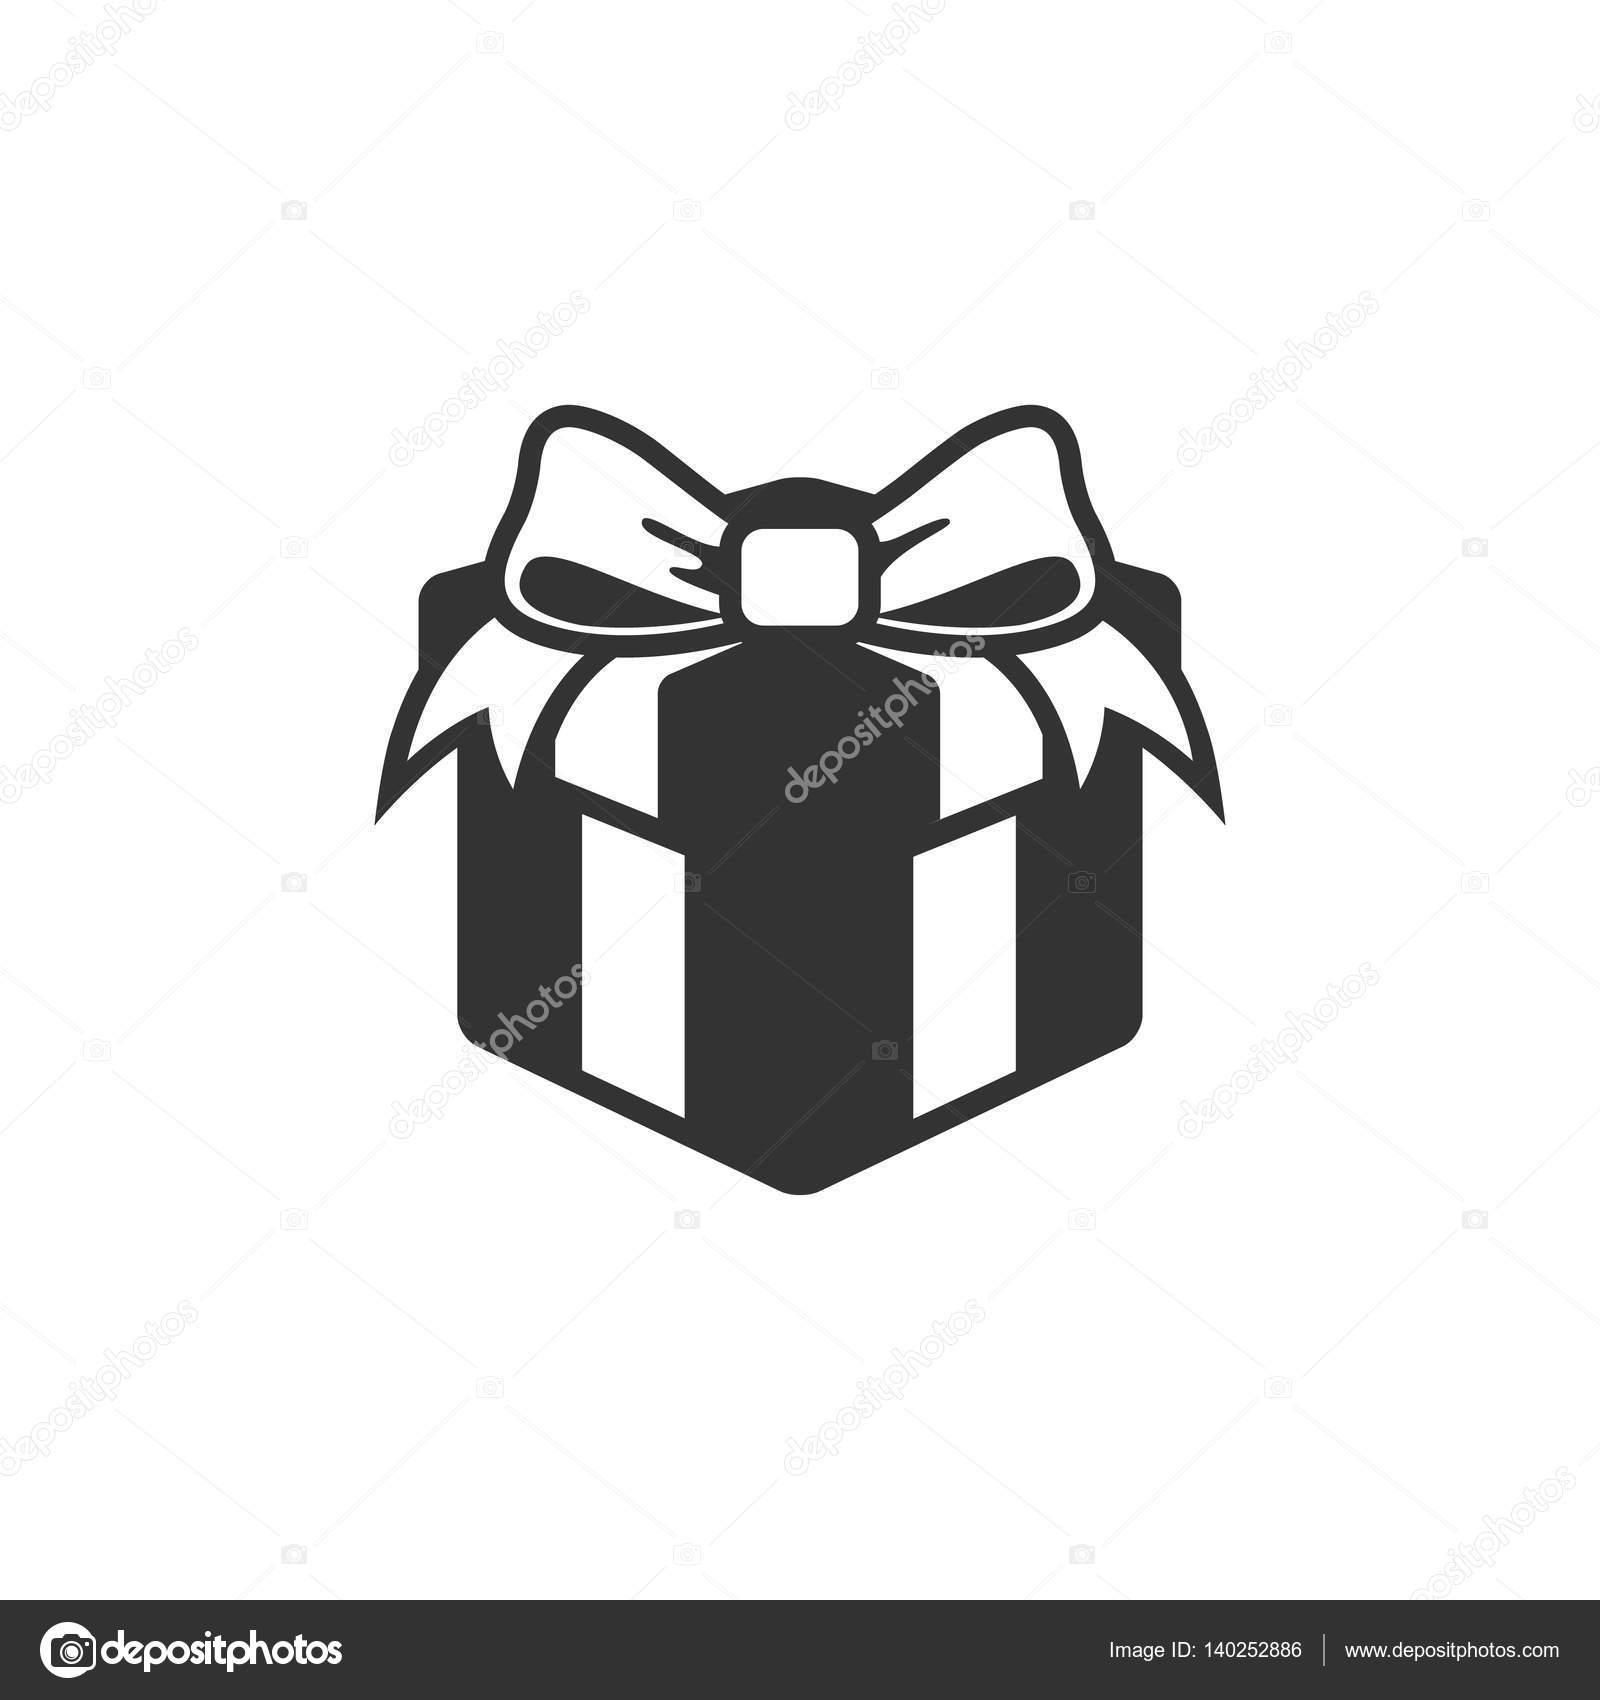 Gift box icon in single grey color stock vector puruan 140252886 gift box icon in single grey color stock vector negle Gallery